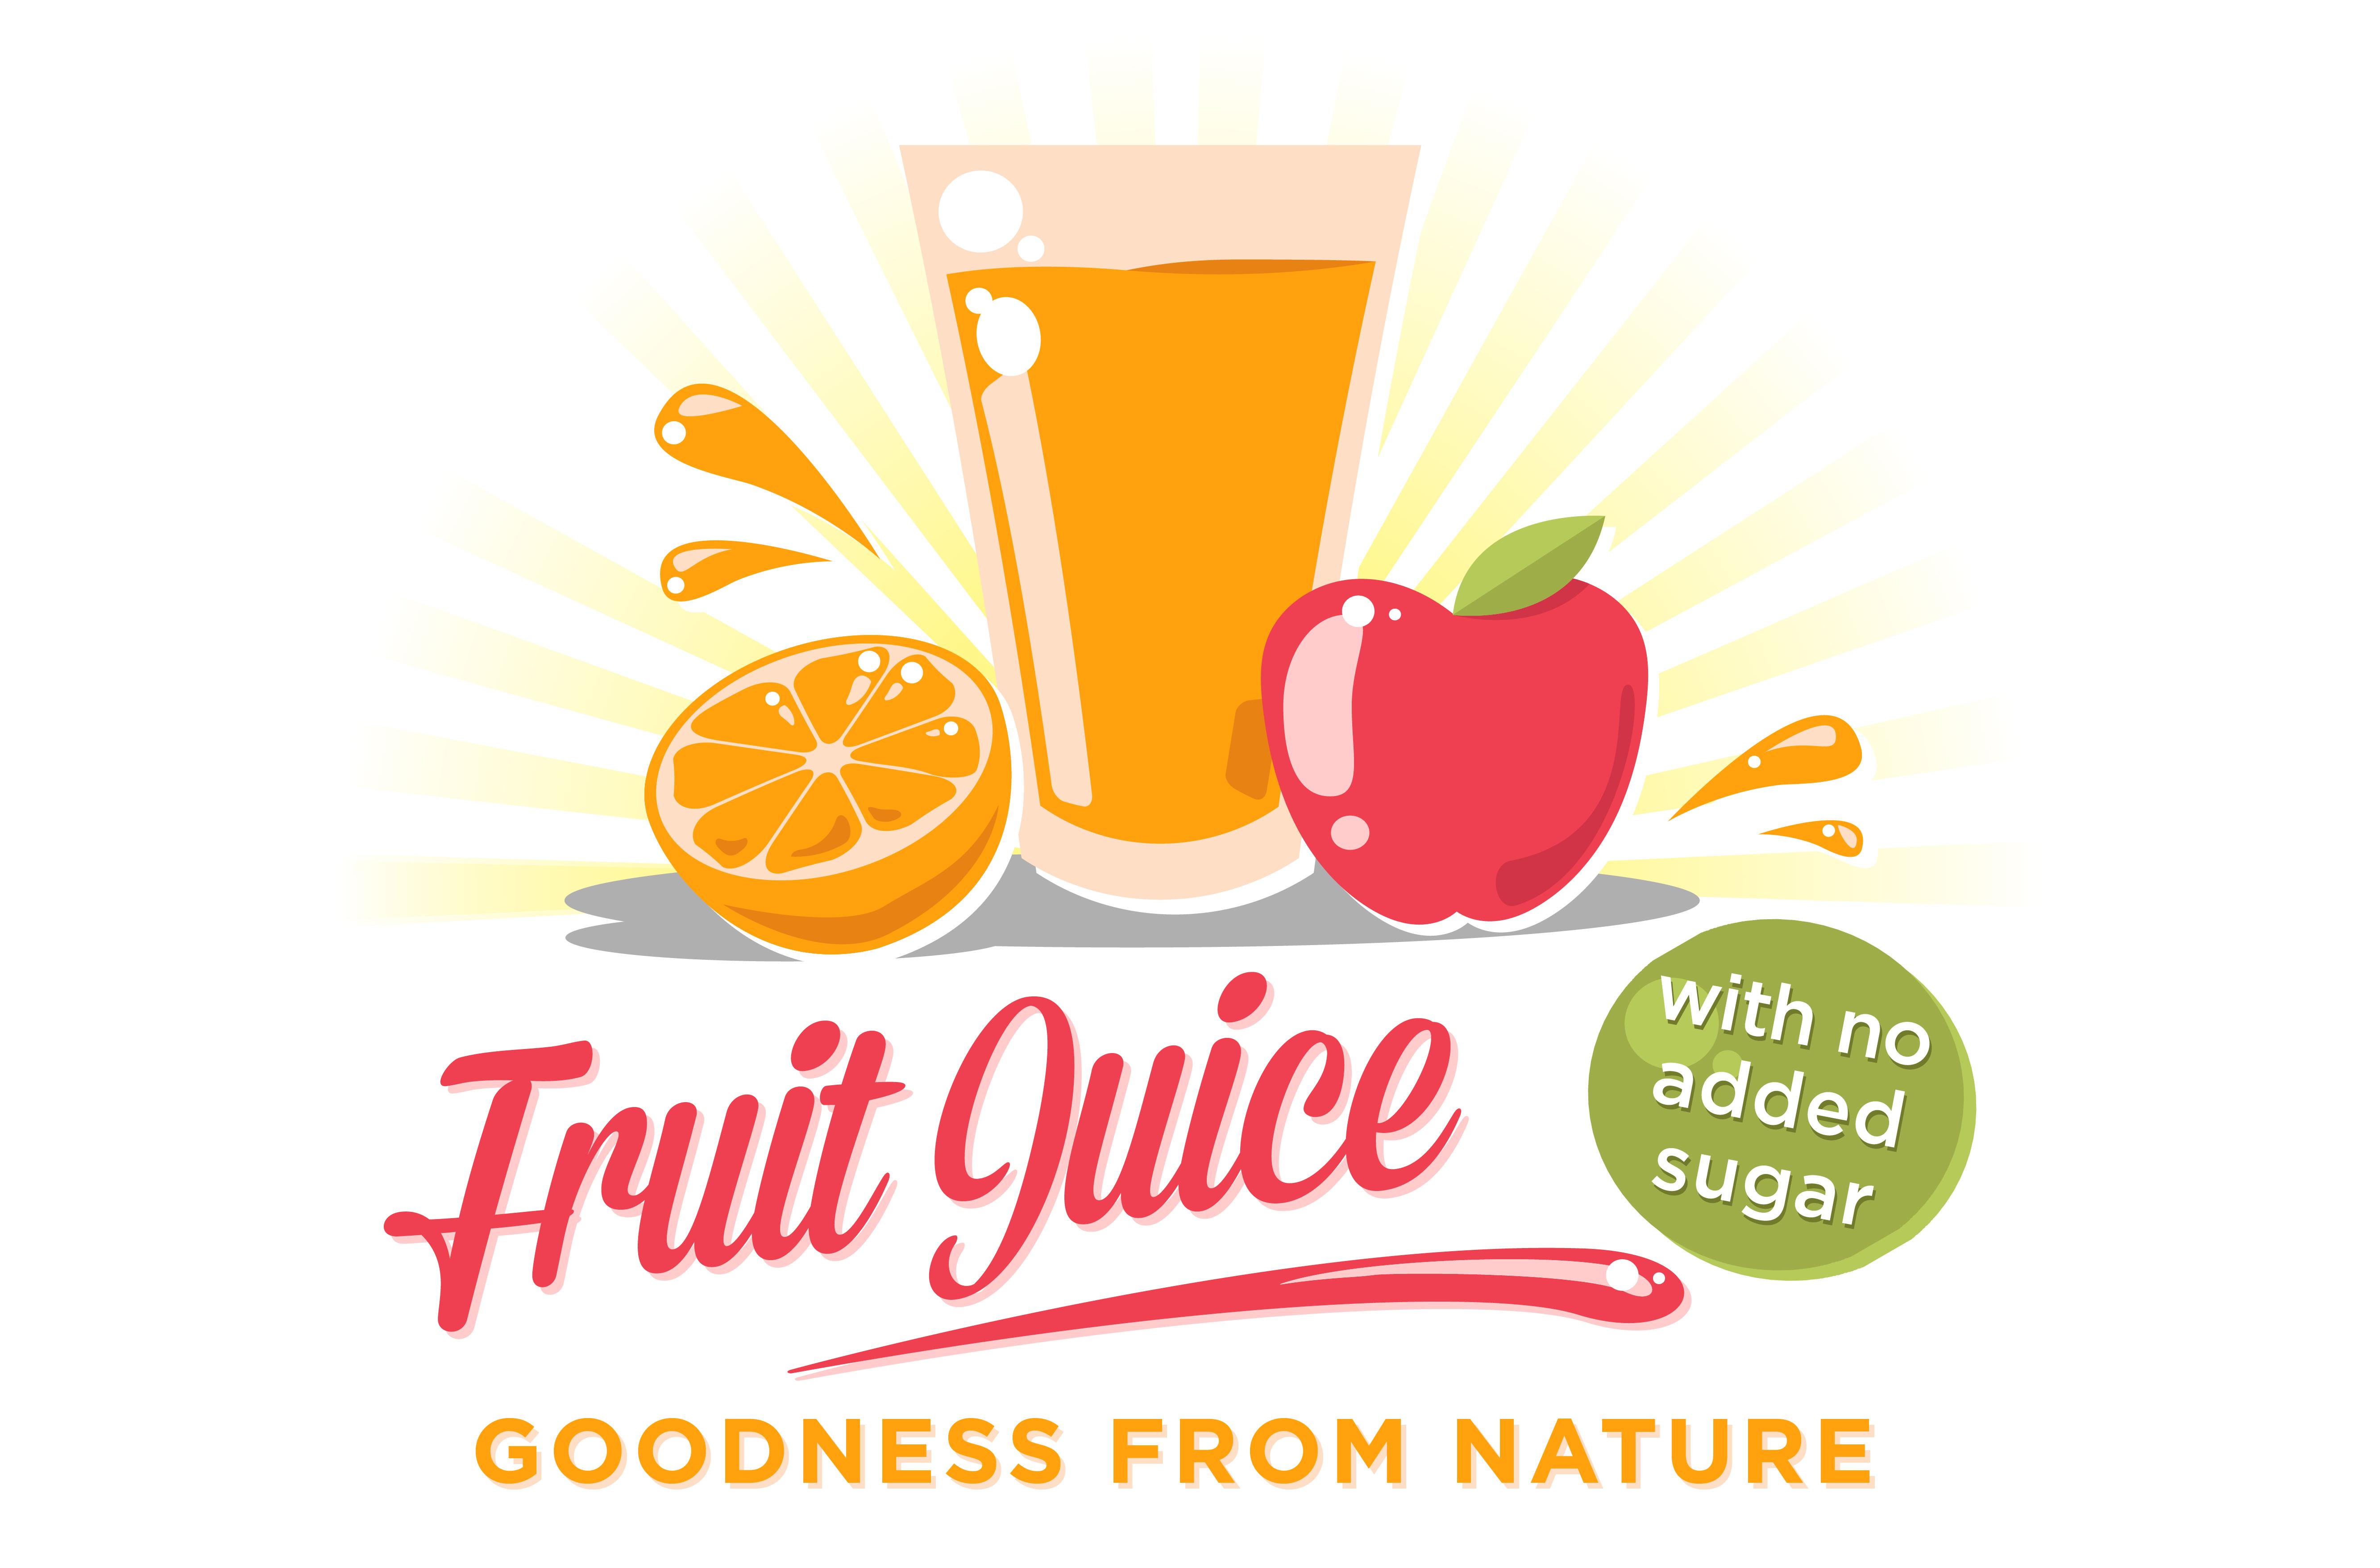 Fruit Juice (no added sugar) & Fruit Drinks | Fruit Juice Australia